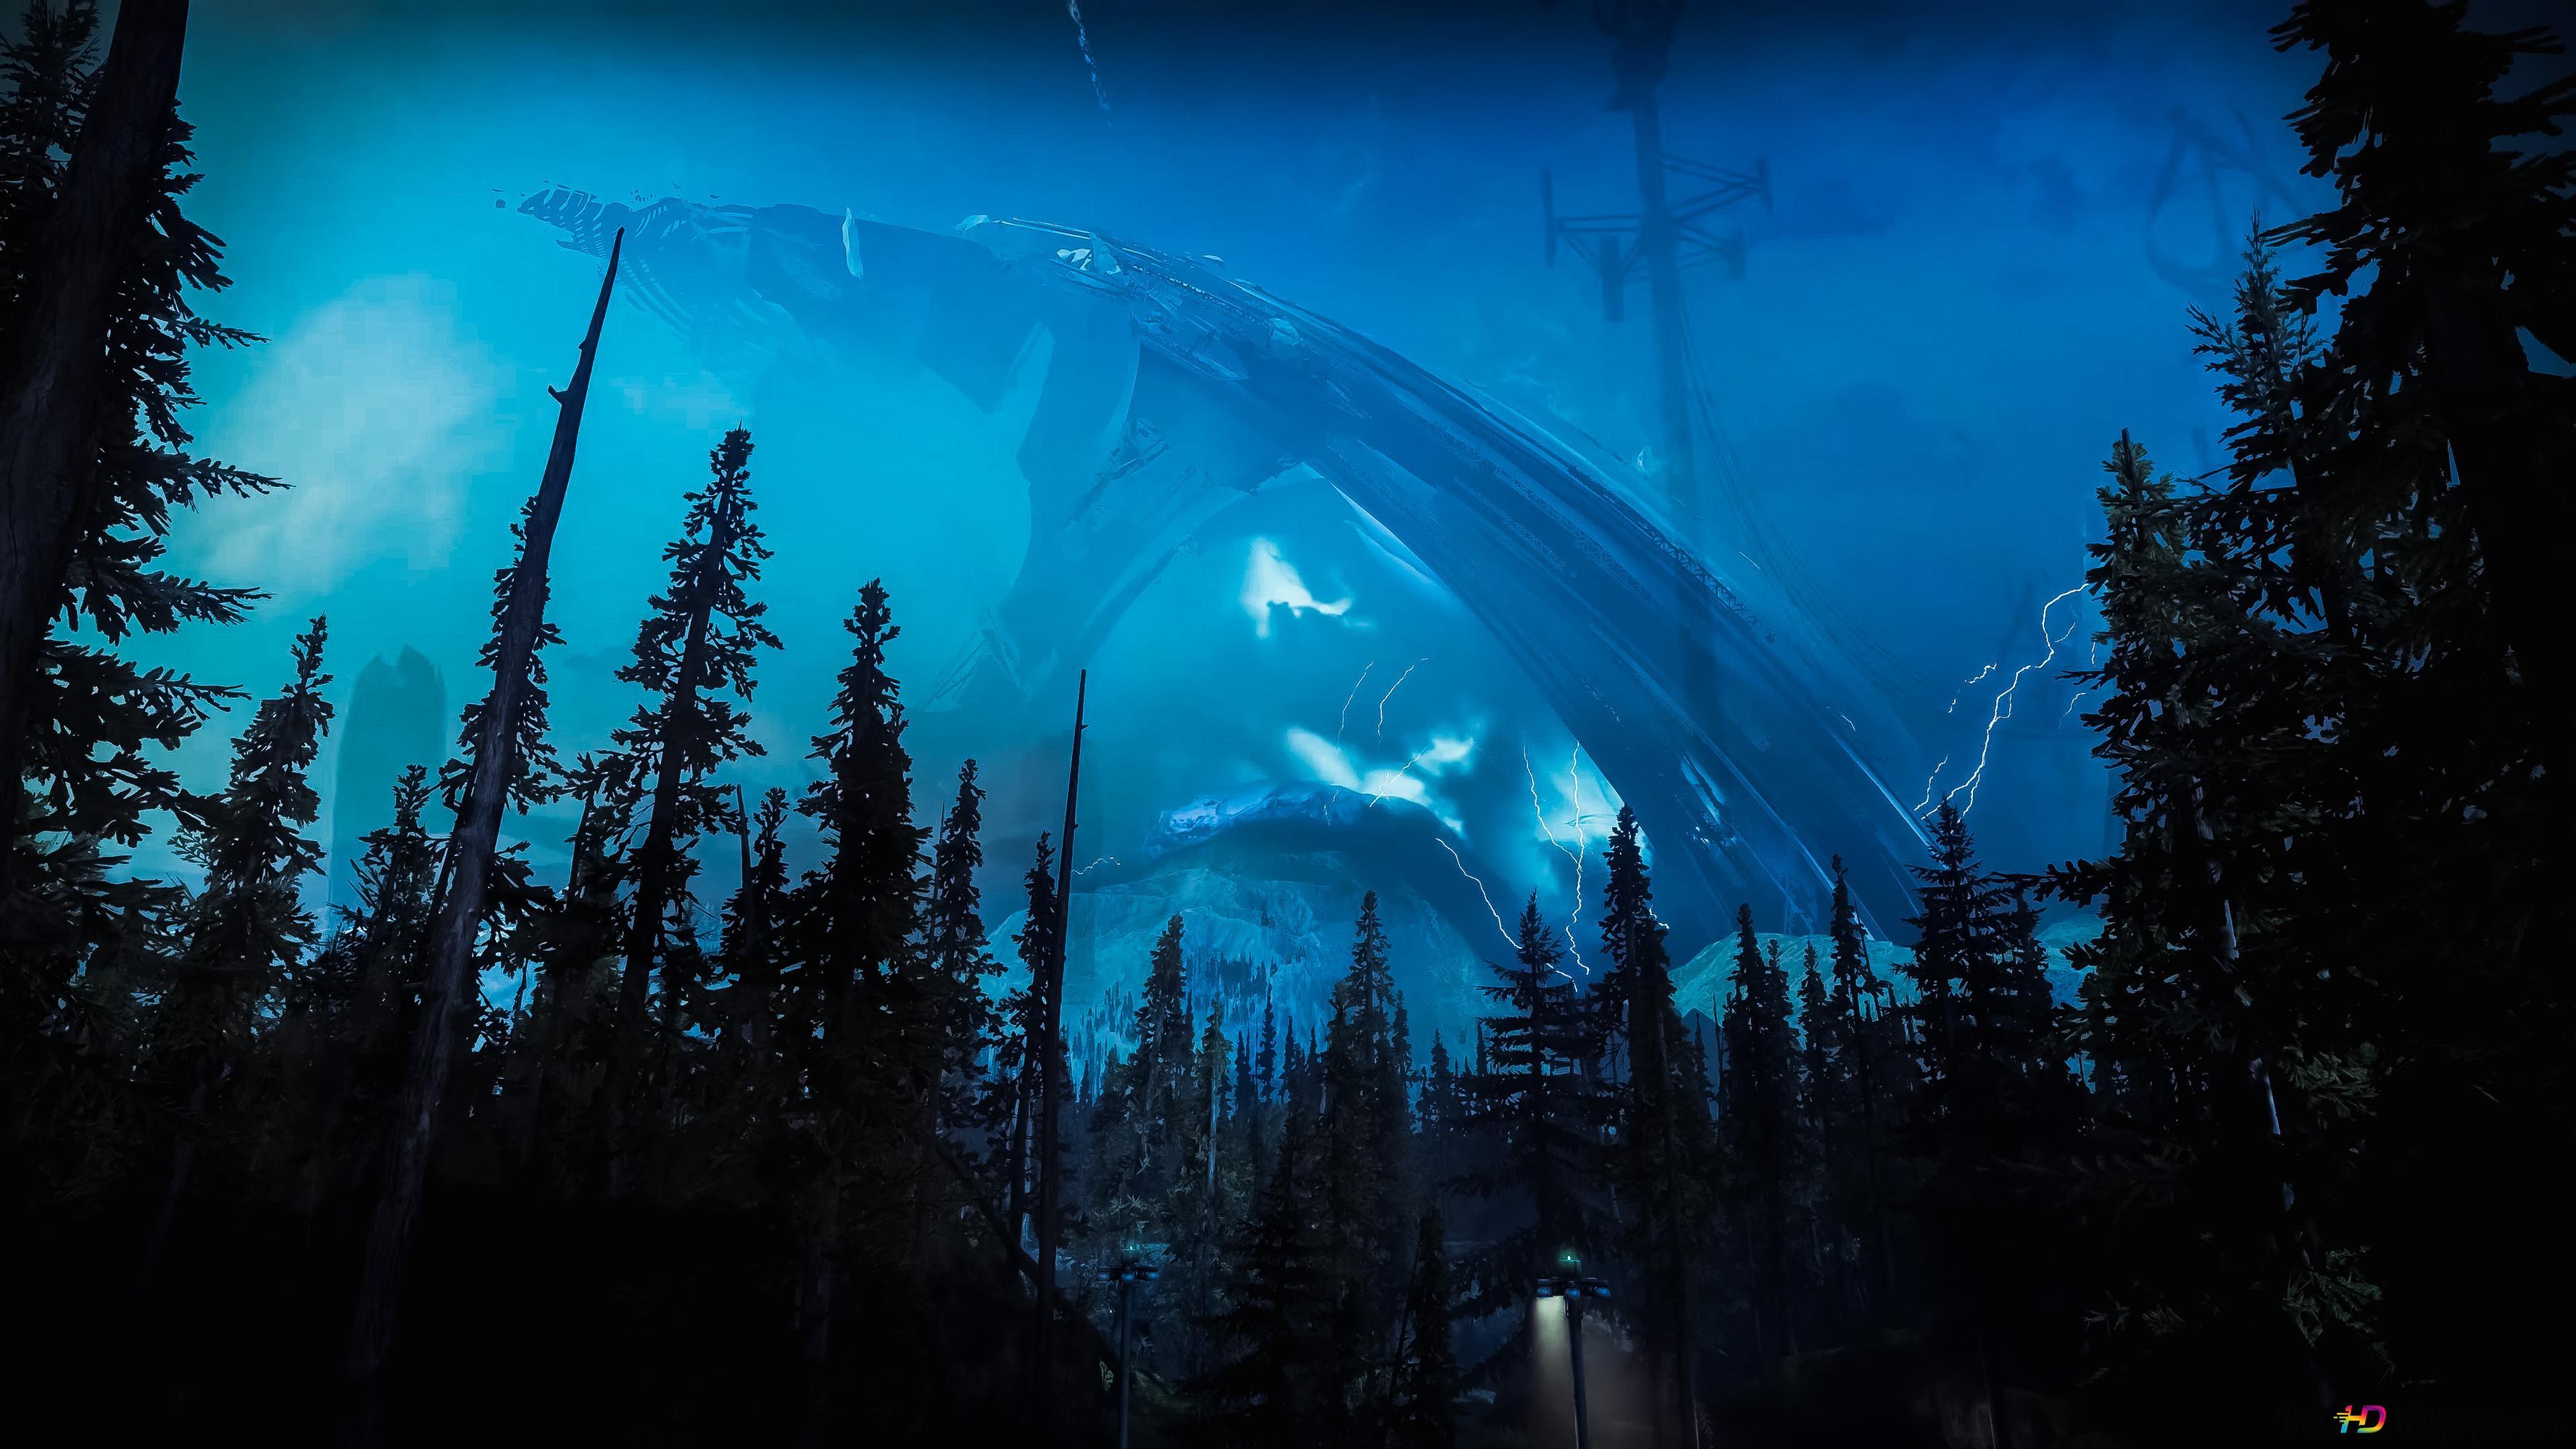 Destiny 2 Forsaken Hd Wallpaper Download